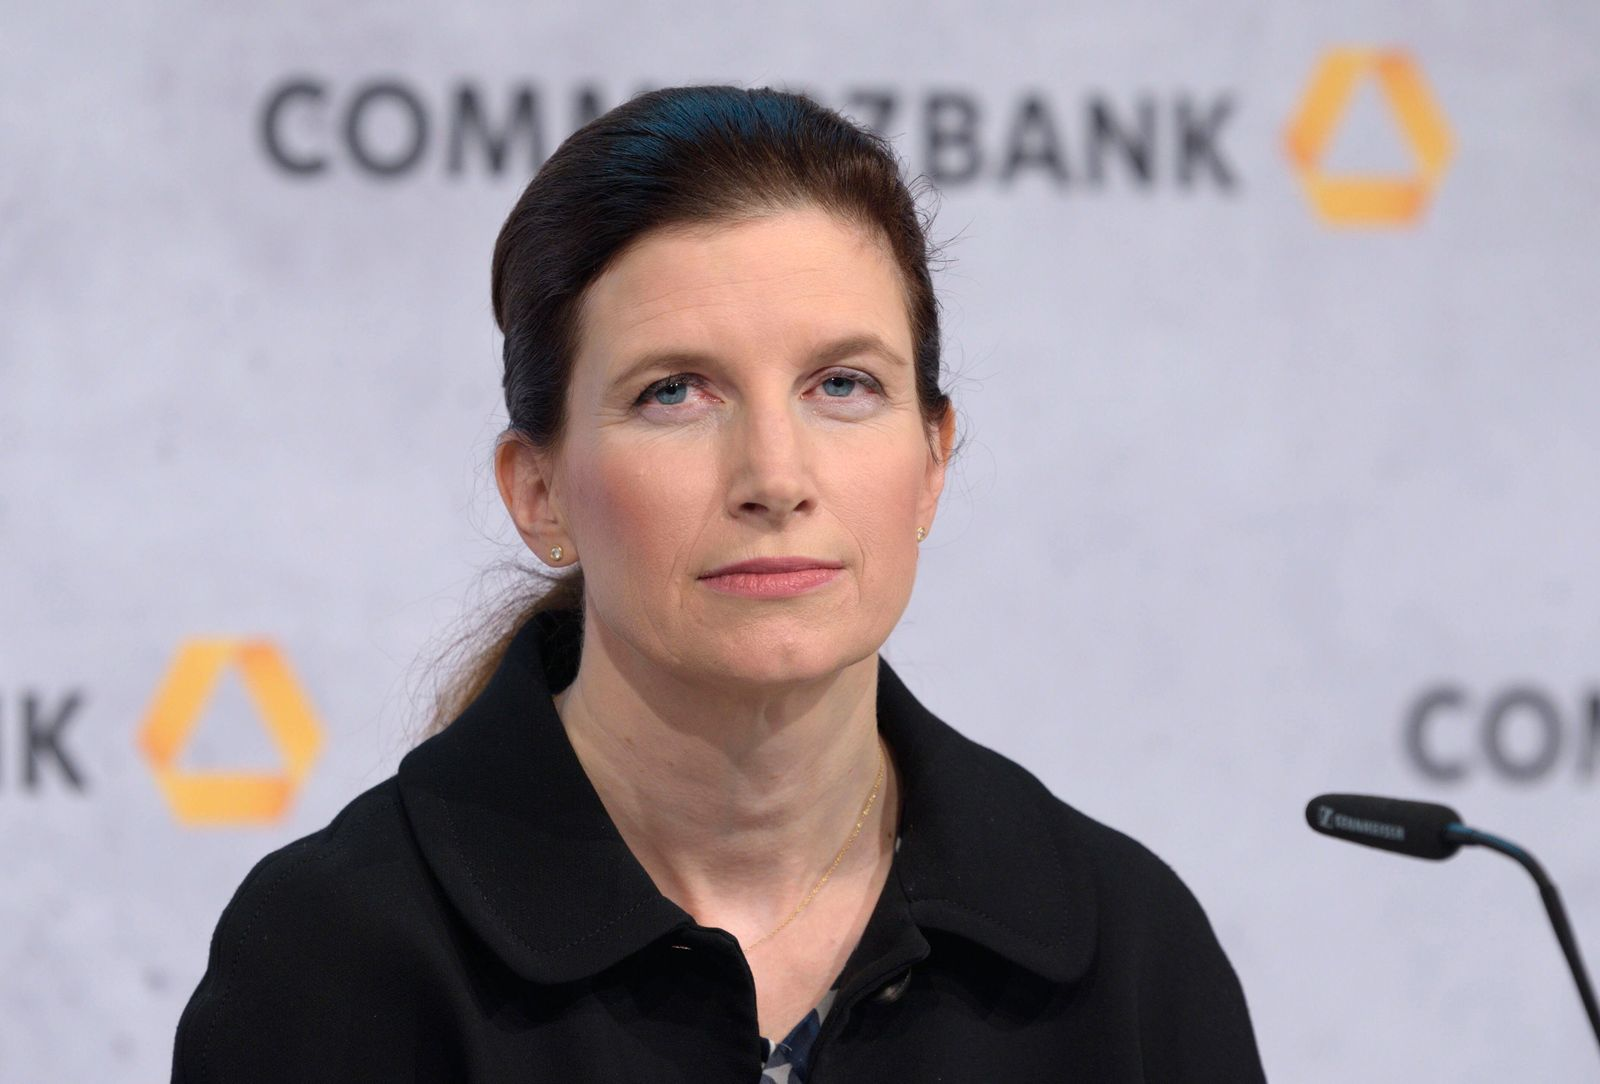 Bilanzpressekonferenz der Commerzbank AG am 13.02.2020 : Bettina ORLOPP , Finanzvorstand Annual press conference of Comm